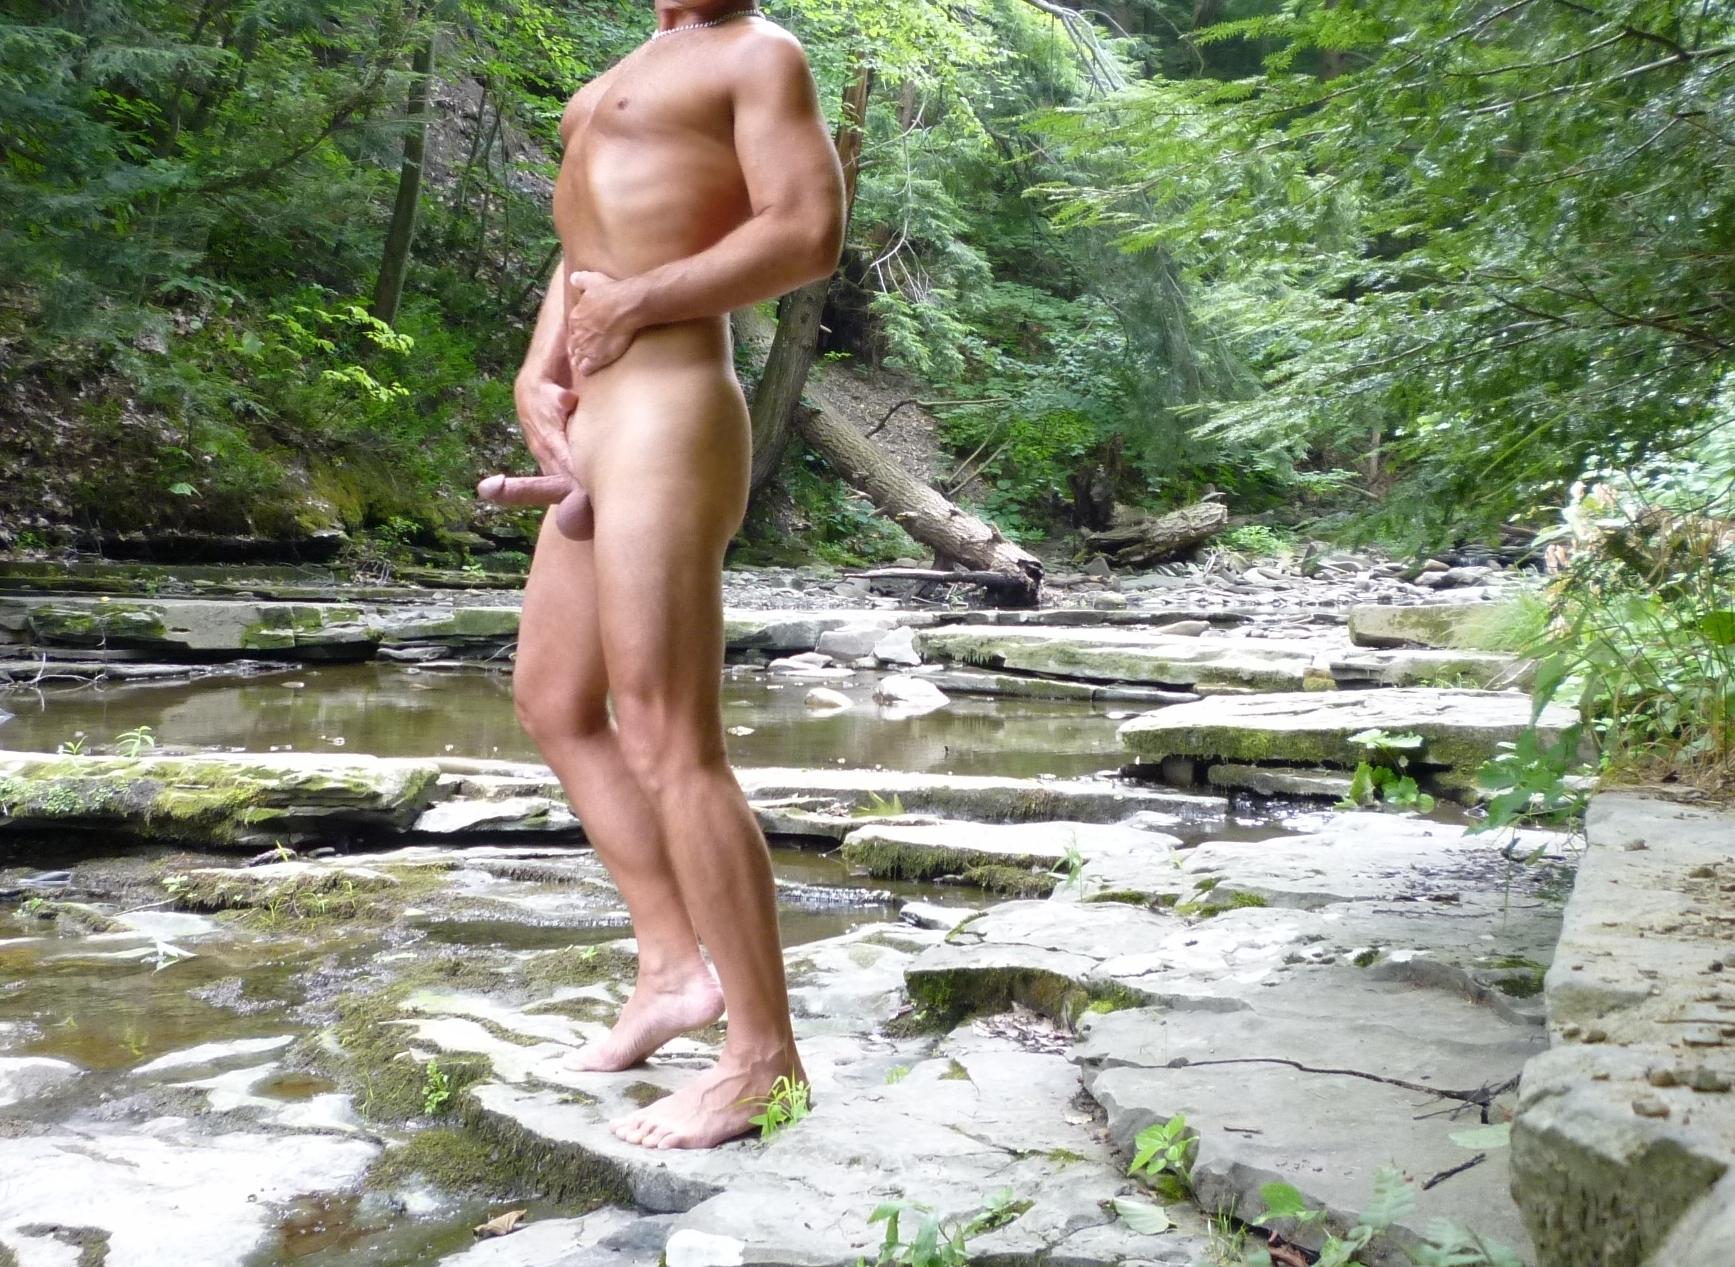 nude-outdoor-dudes